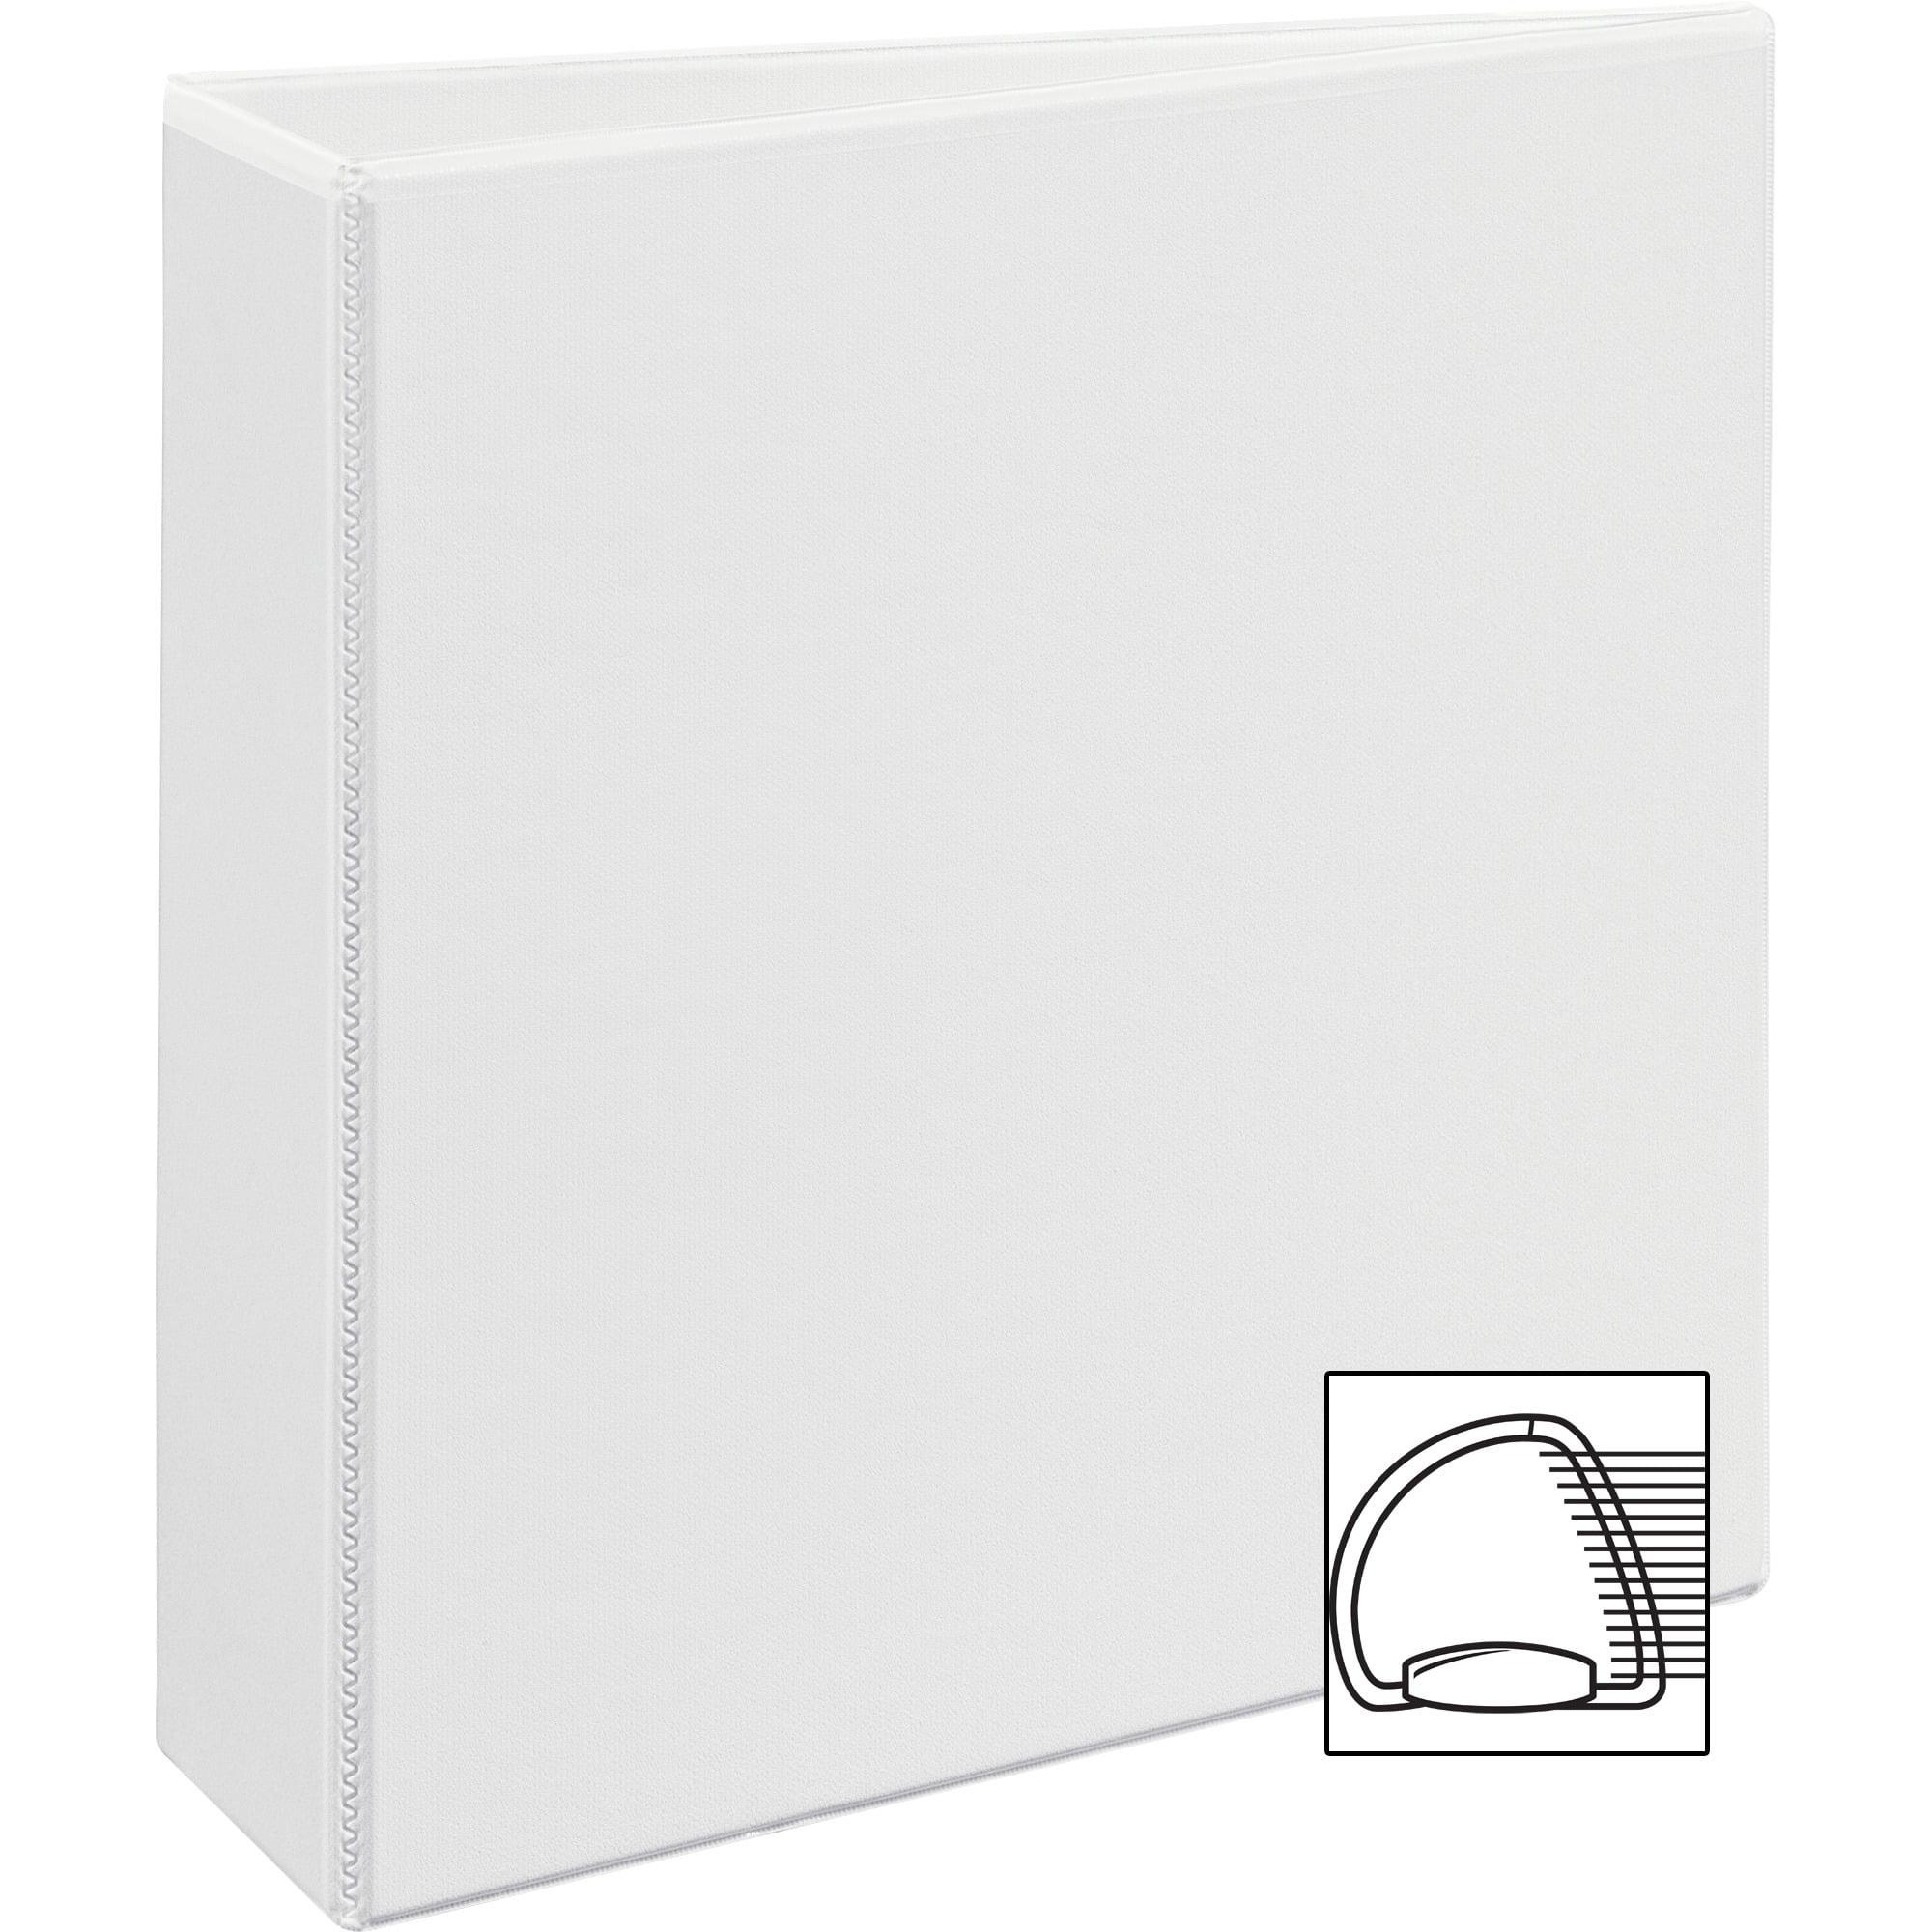 "Avery Durable View Binder w/Nonlocking EZD Rings, 11 x 8 1/2, 3"" Cap, White"